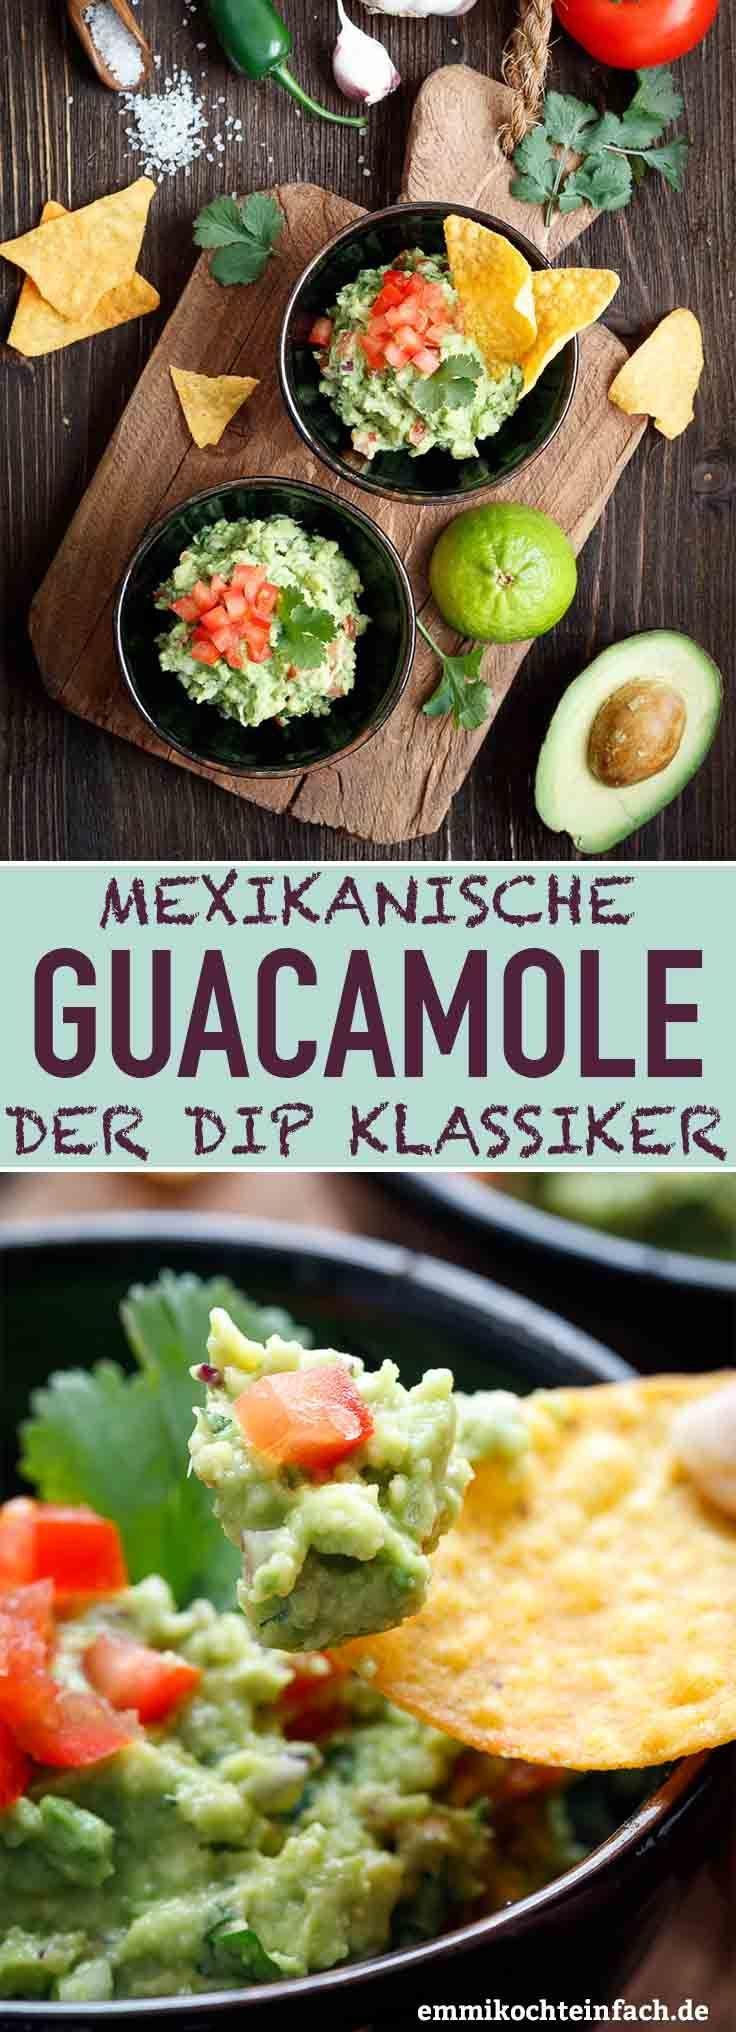 Mexikanische Guacamole - Der einfache Dip-Klassiker #vegetarischerezepteschnell